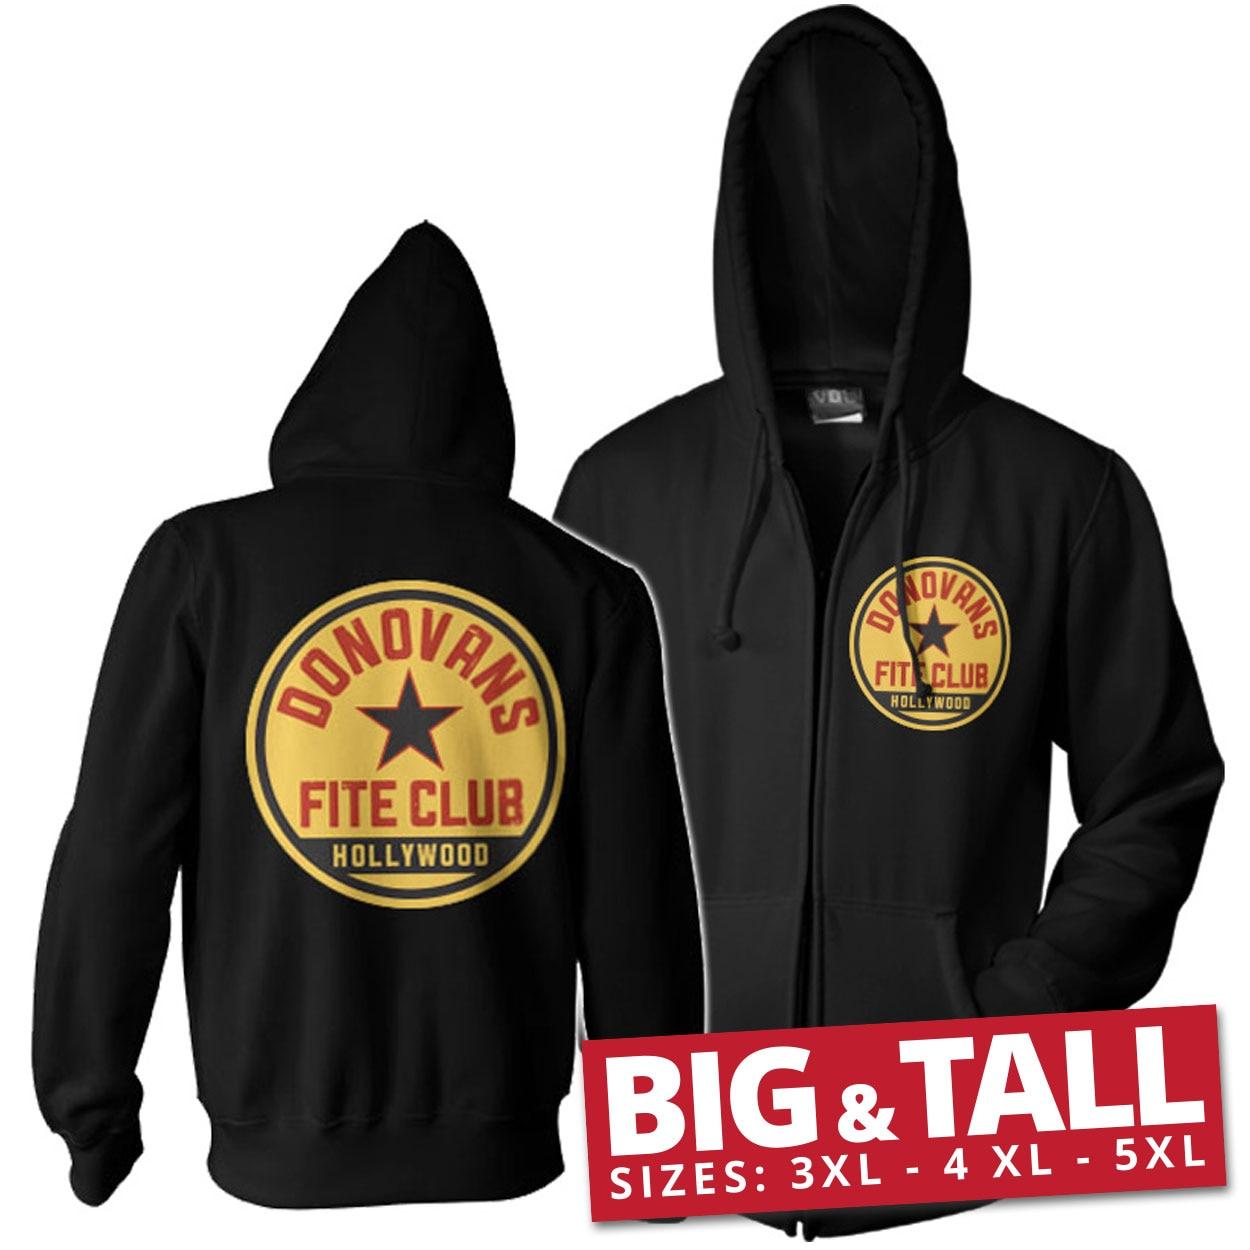 Donovans Fite Club Big & Tall Zipped Hoodie